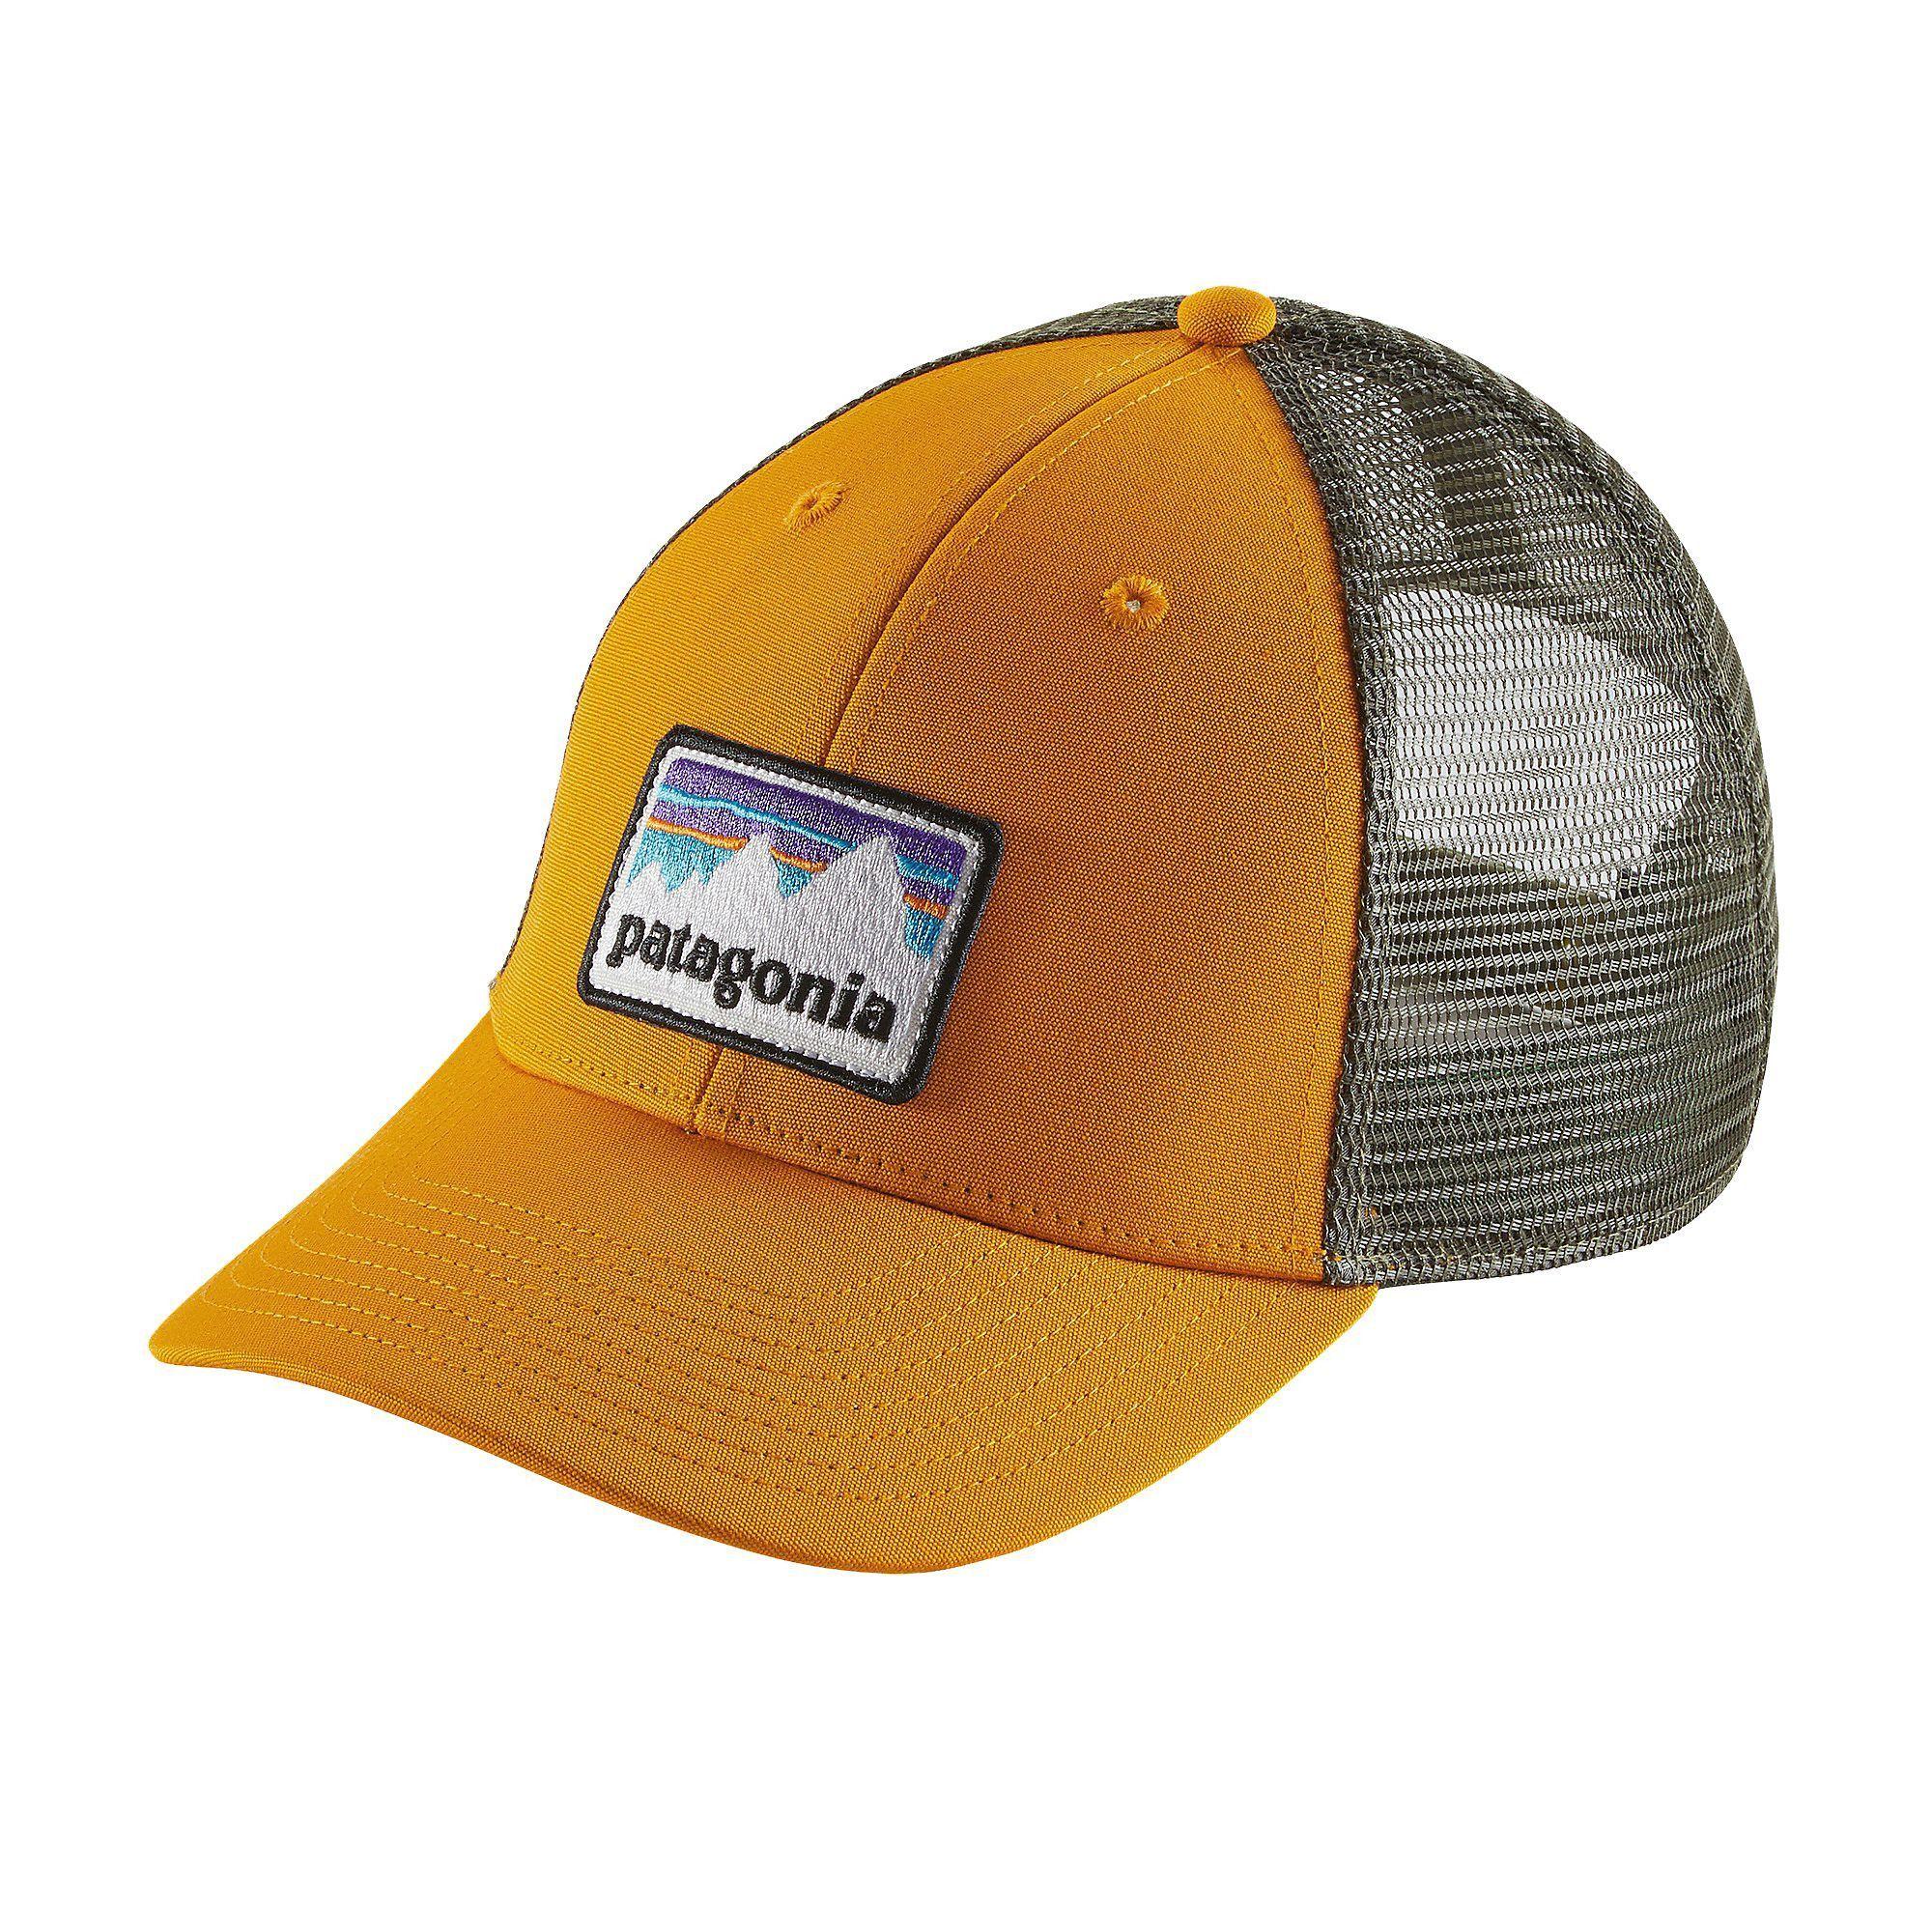 Patagonia Shop Sticker Patch LoPro Trucker Hat in 2018  aec88fcc825